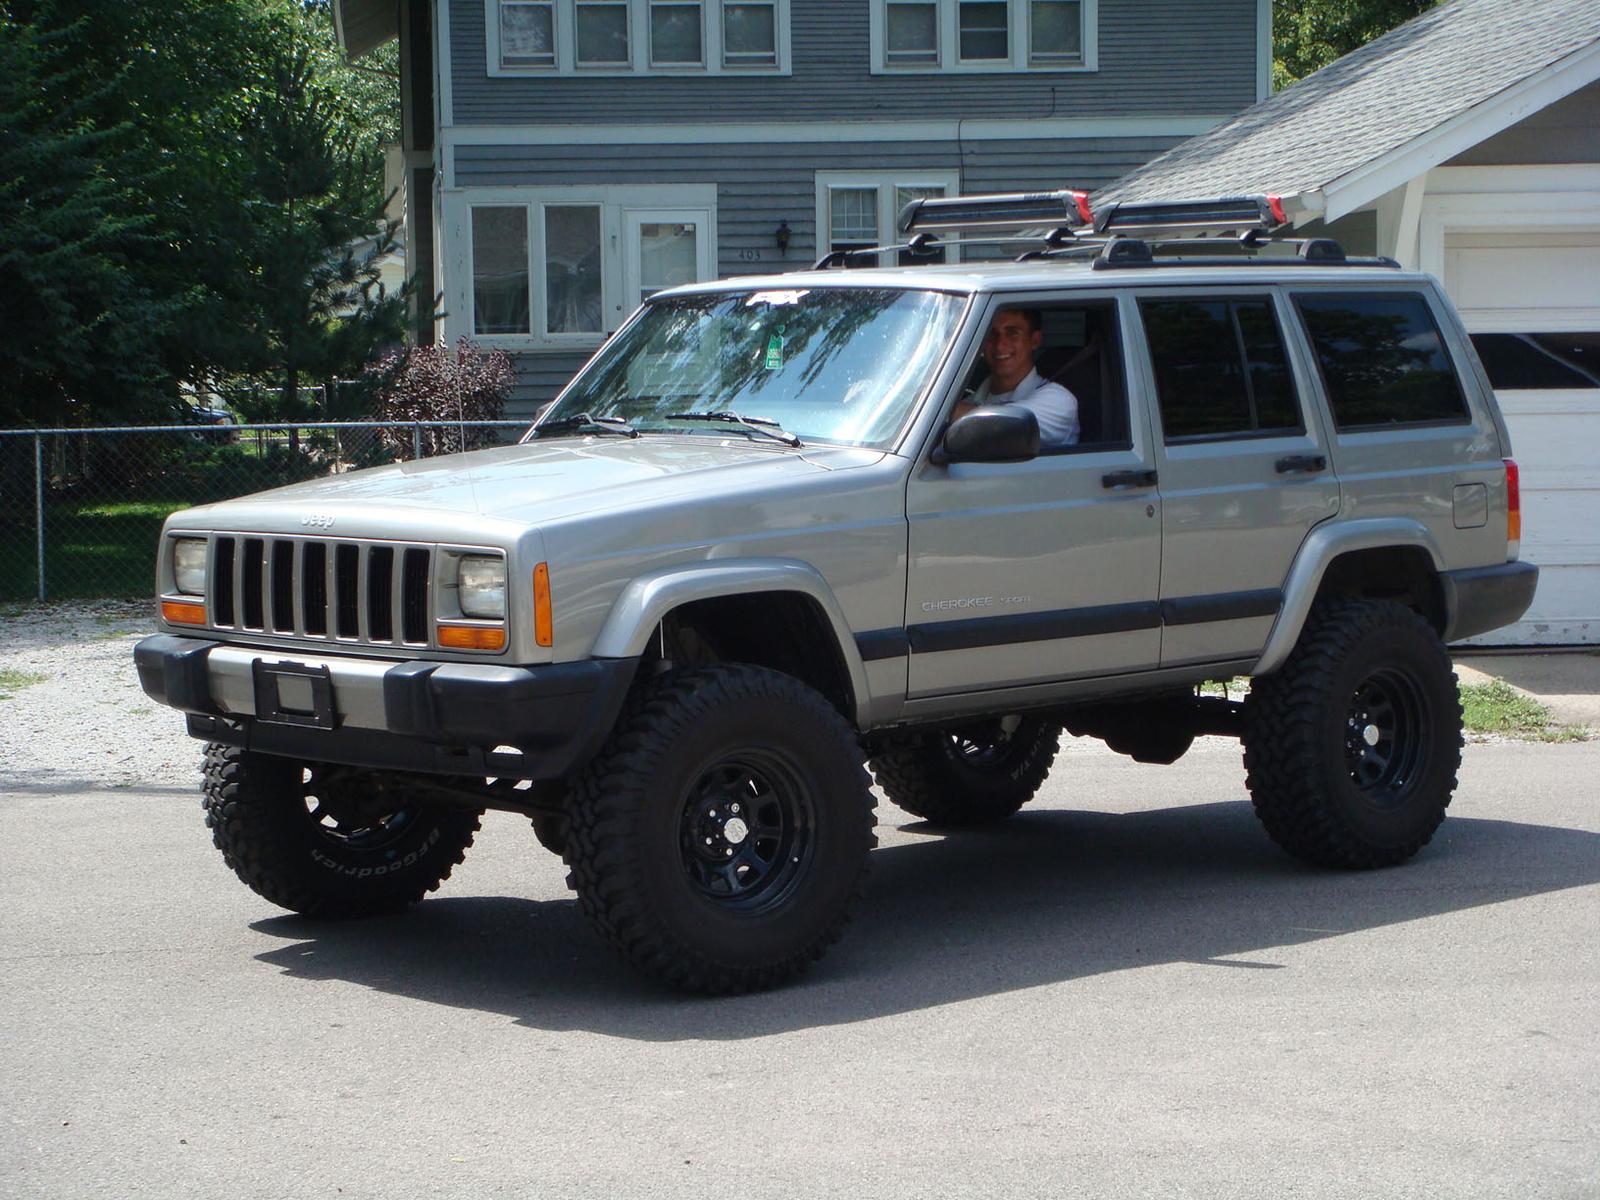 1998 Jeep Cherokee Xj >> 2000 Jeep Cherokee - Information and photos - ZombieDrive